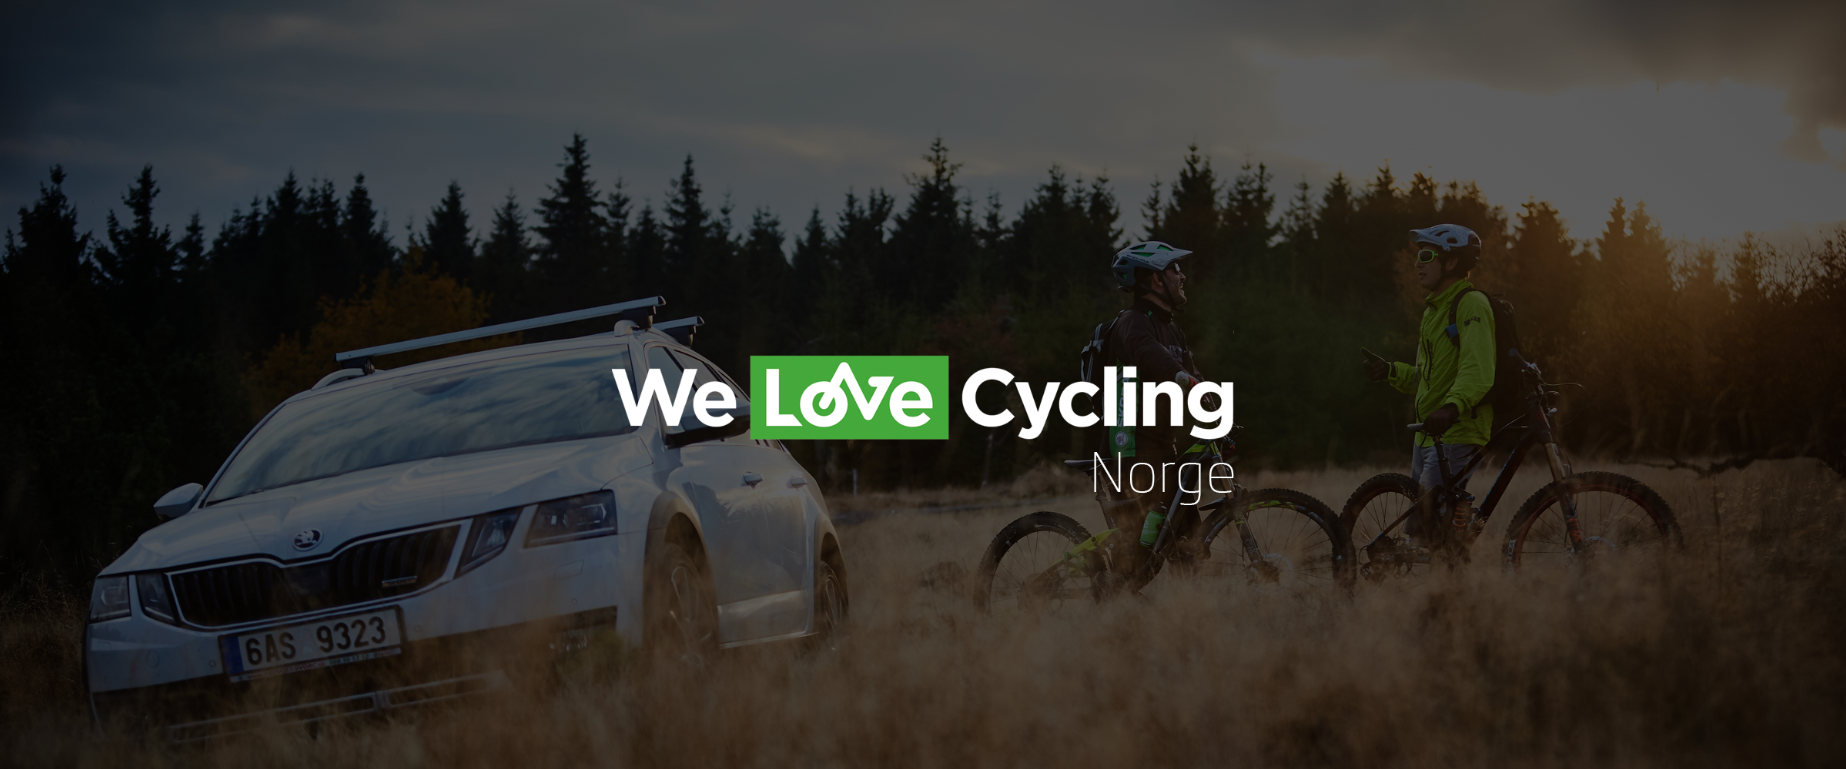 Welovecycling – welovecycling norge – skoda sykkel - vi elsker sykkel – sykkelglede – sykkel i norge – sykkelnyheter – sykkelnytt – norsk sykkelsport – nyheter for sykkel – sykkel – sykling – sykkel for alle - Norges Cykleforbund - Norges Sykkelforbund